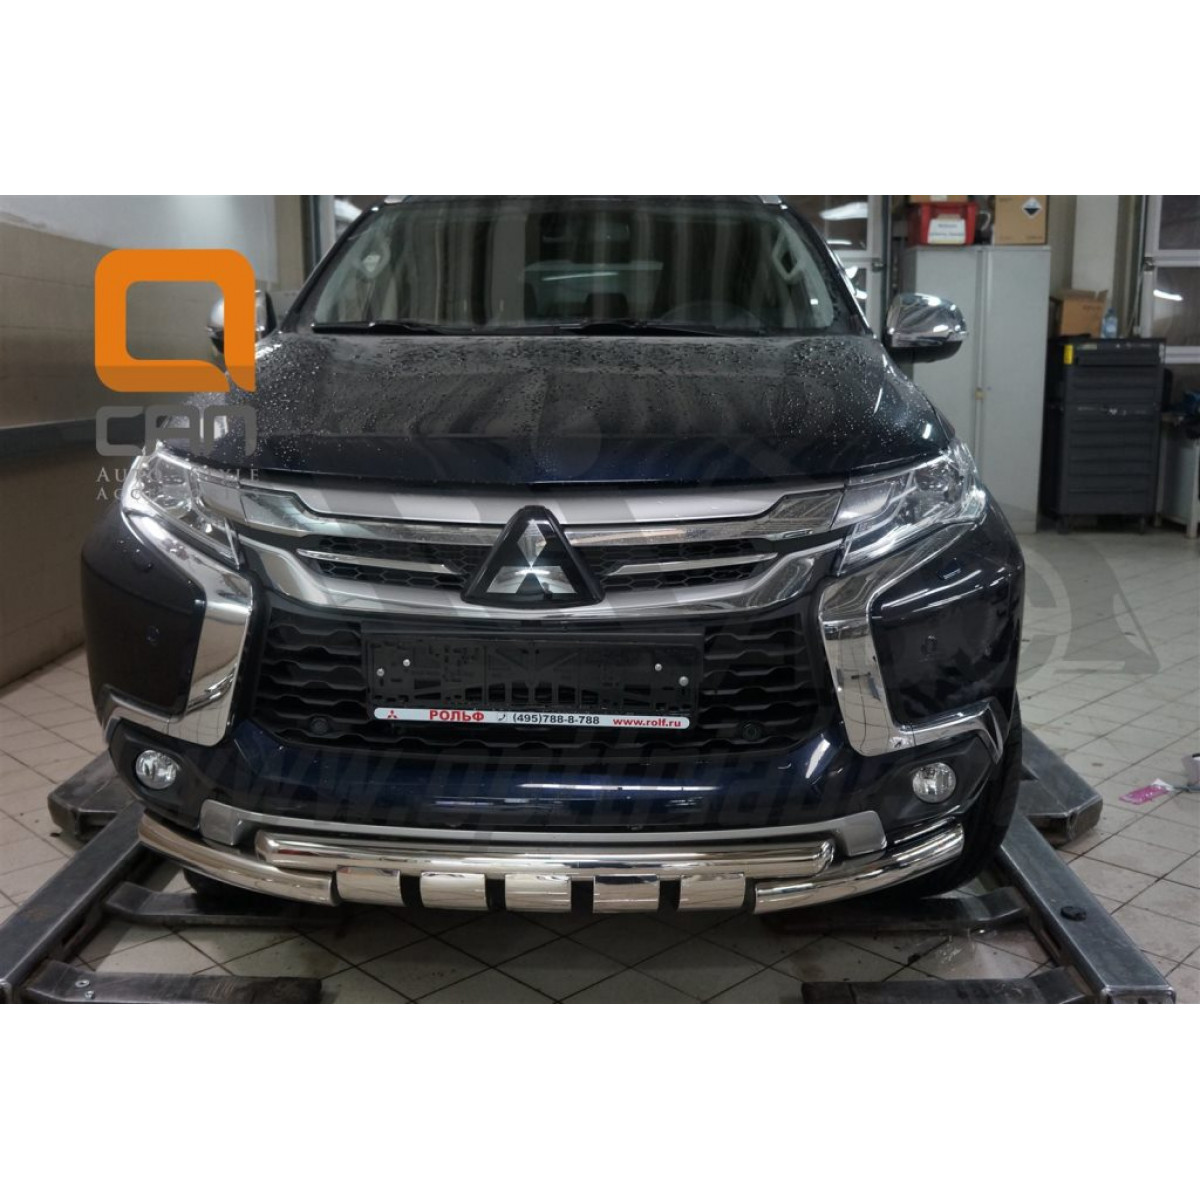 Защита переднего бампера Mitsubishi Pajero Sport 2017